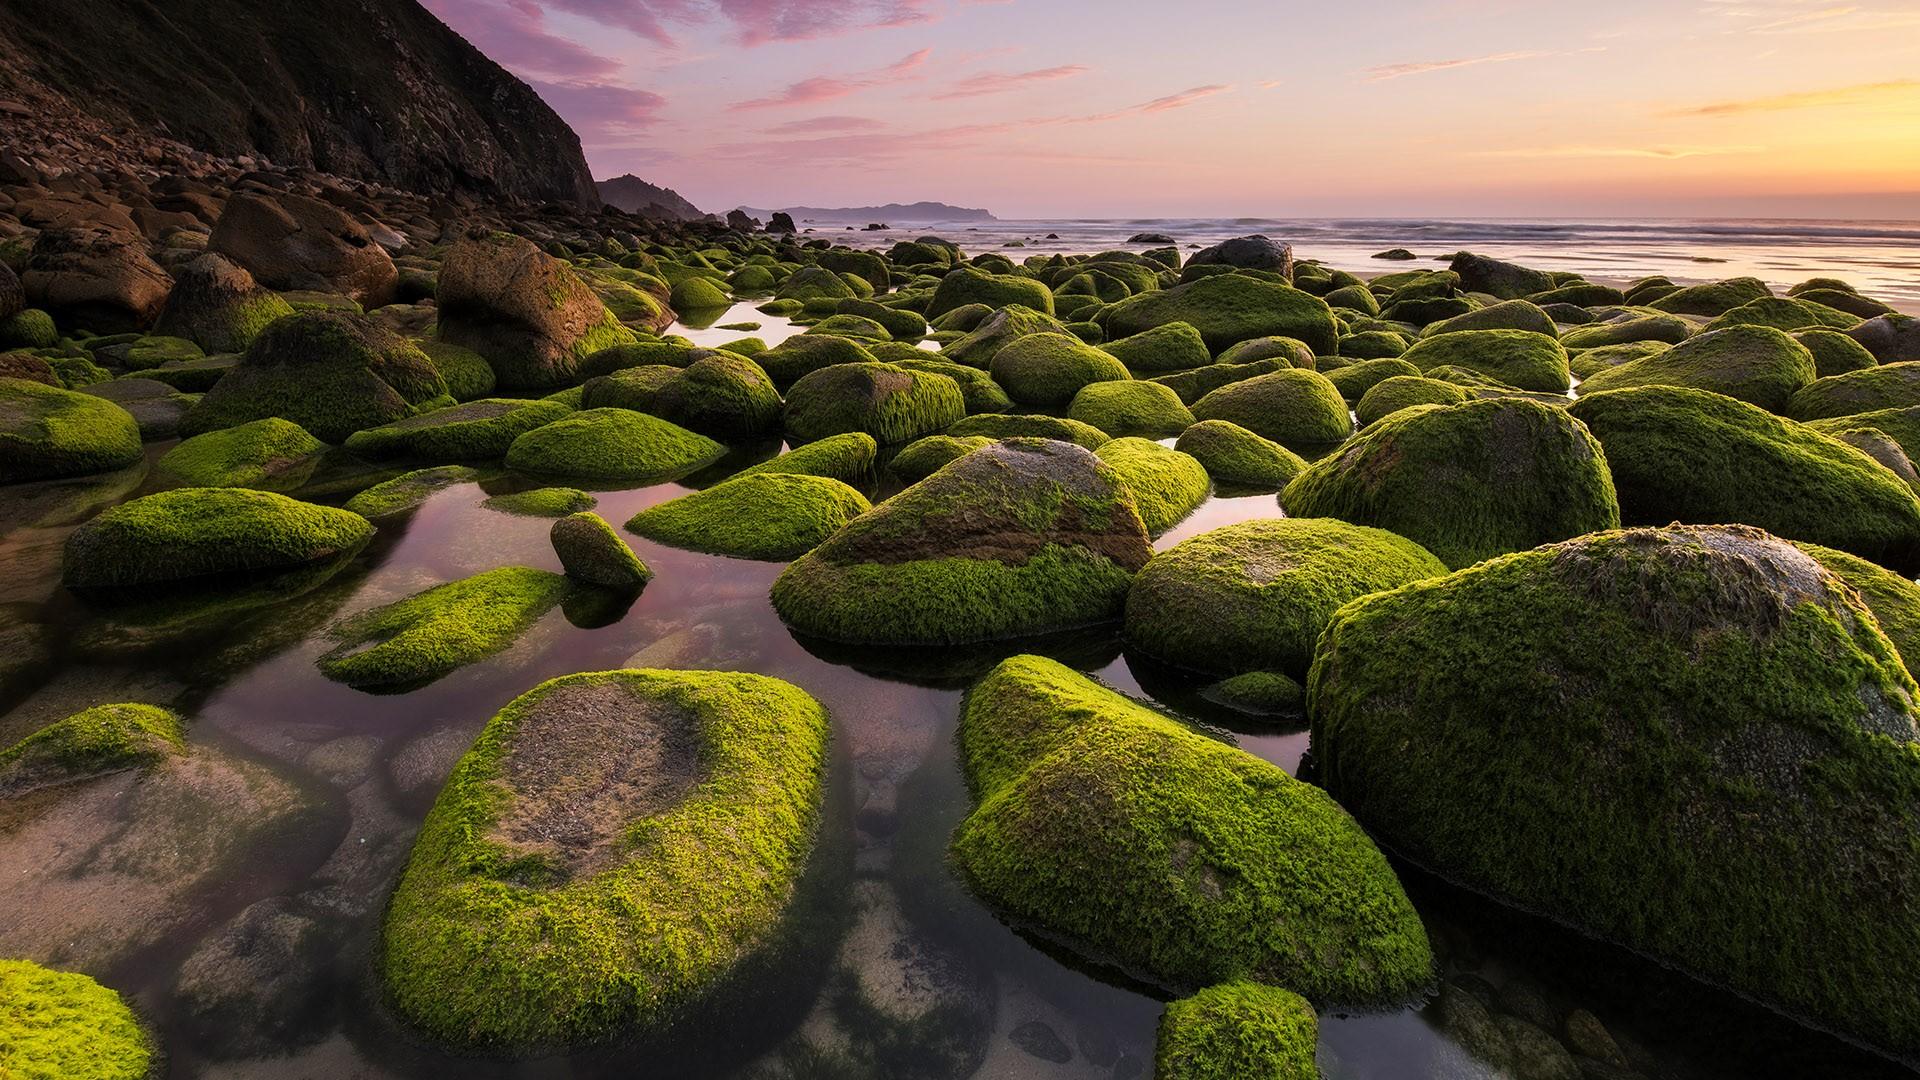 General 1920x1080 nature landscape rocks moss mountains sunset beach coast water sea horizon Galicia Spain